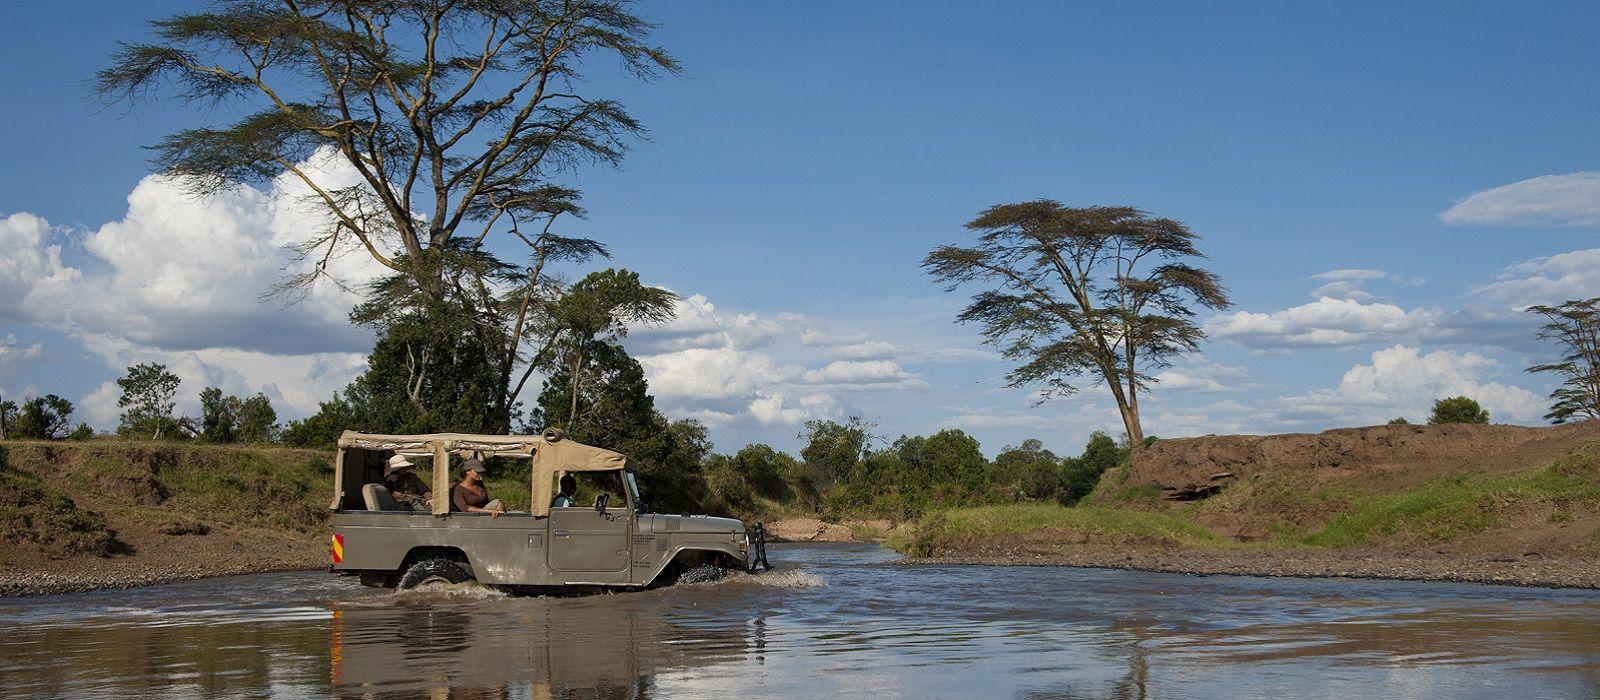 Kenya Off the Beaten Track Tour Trip 2